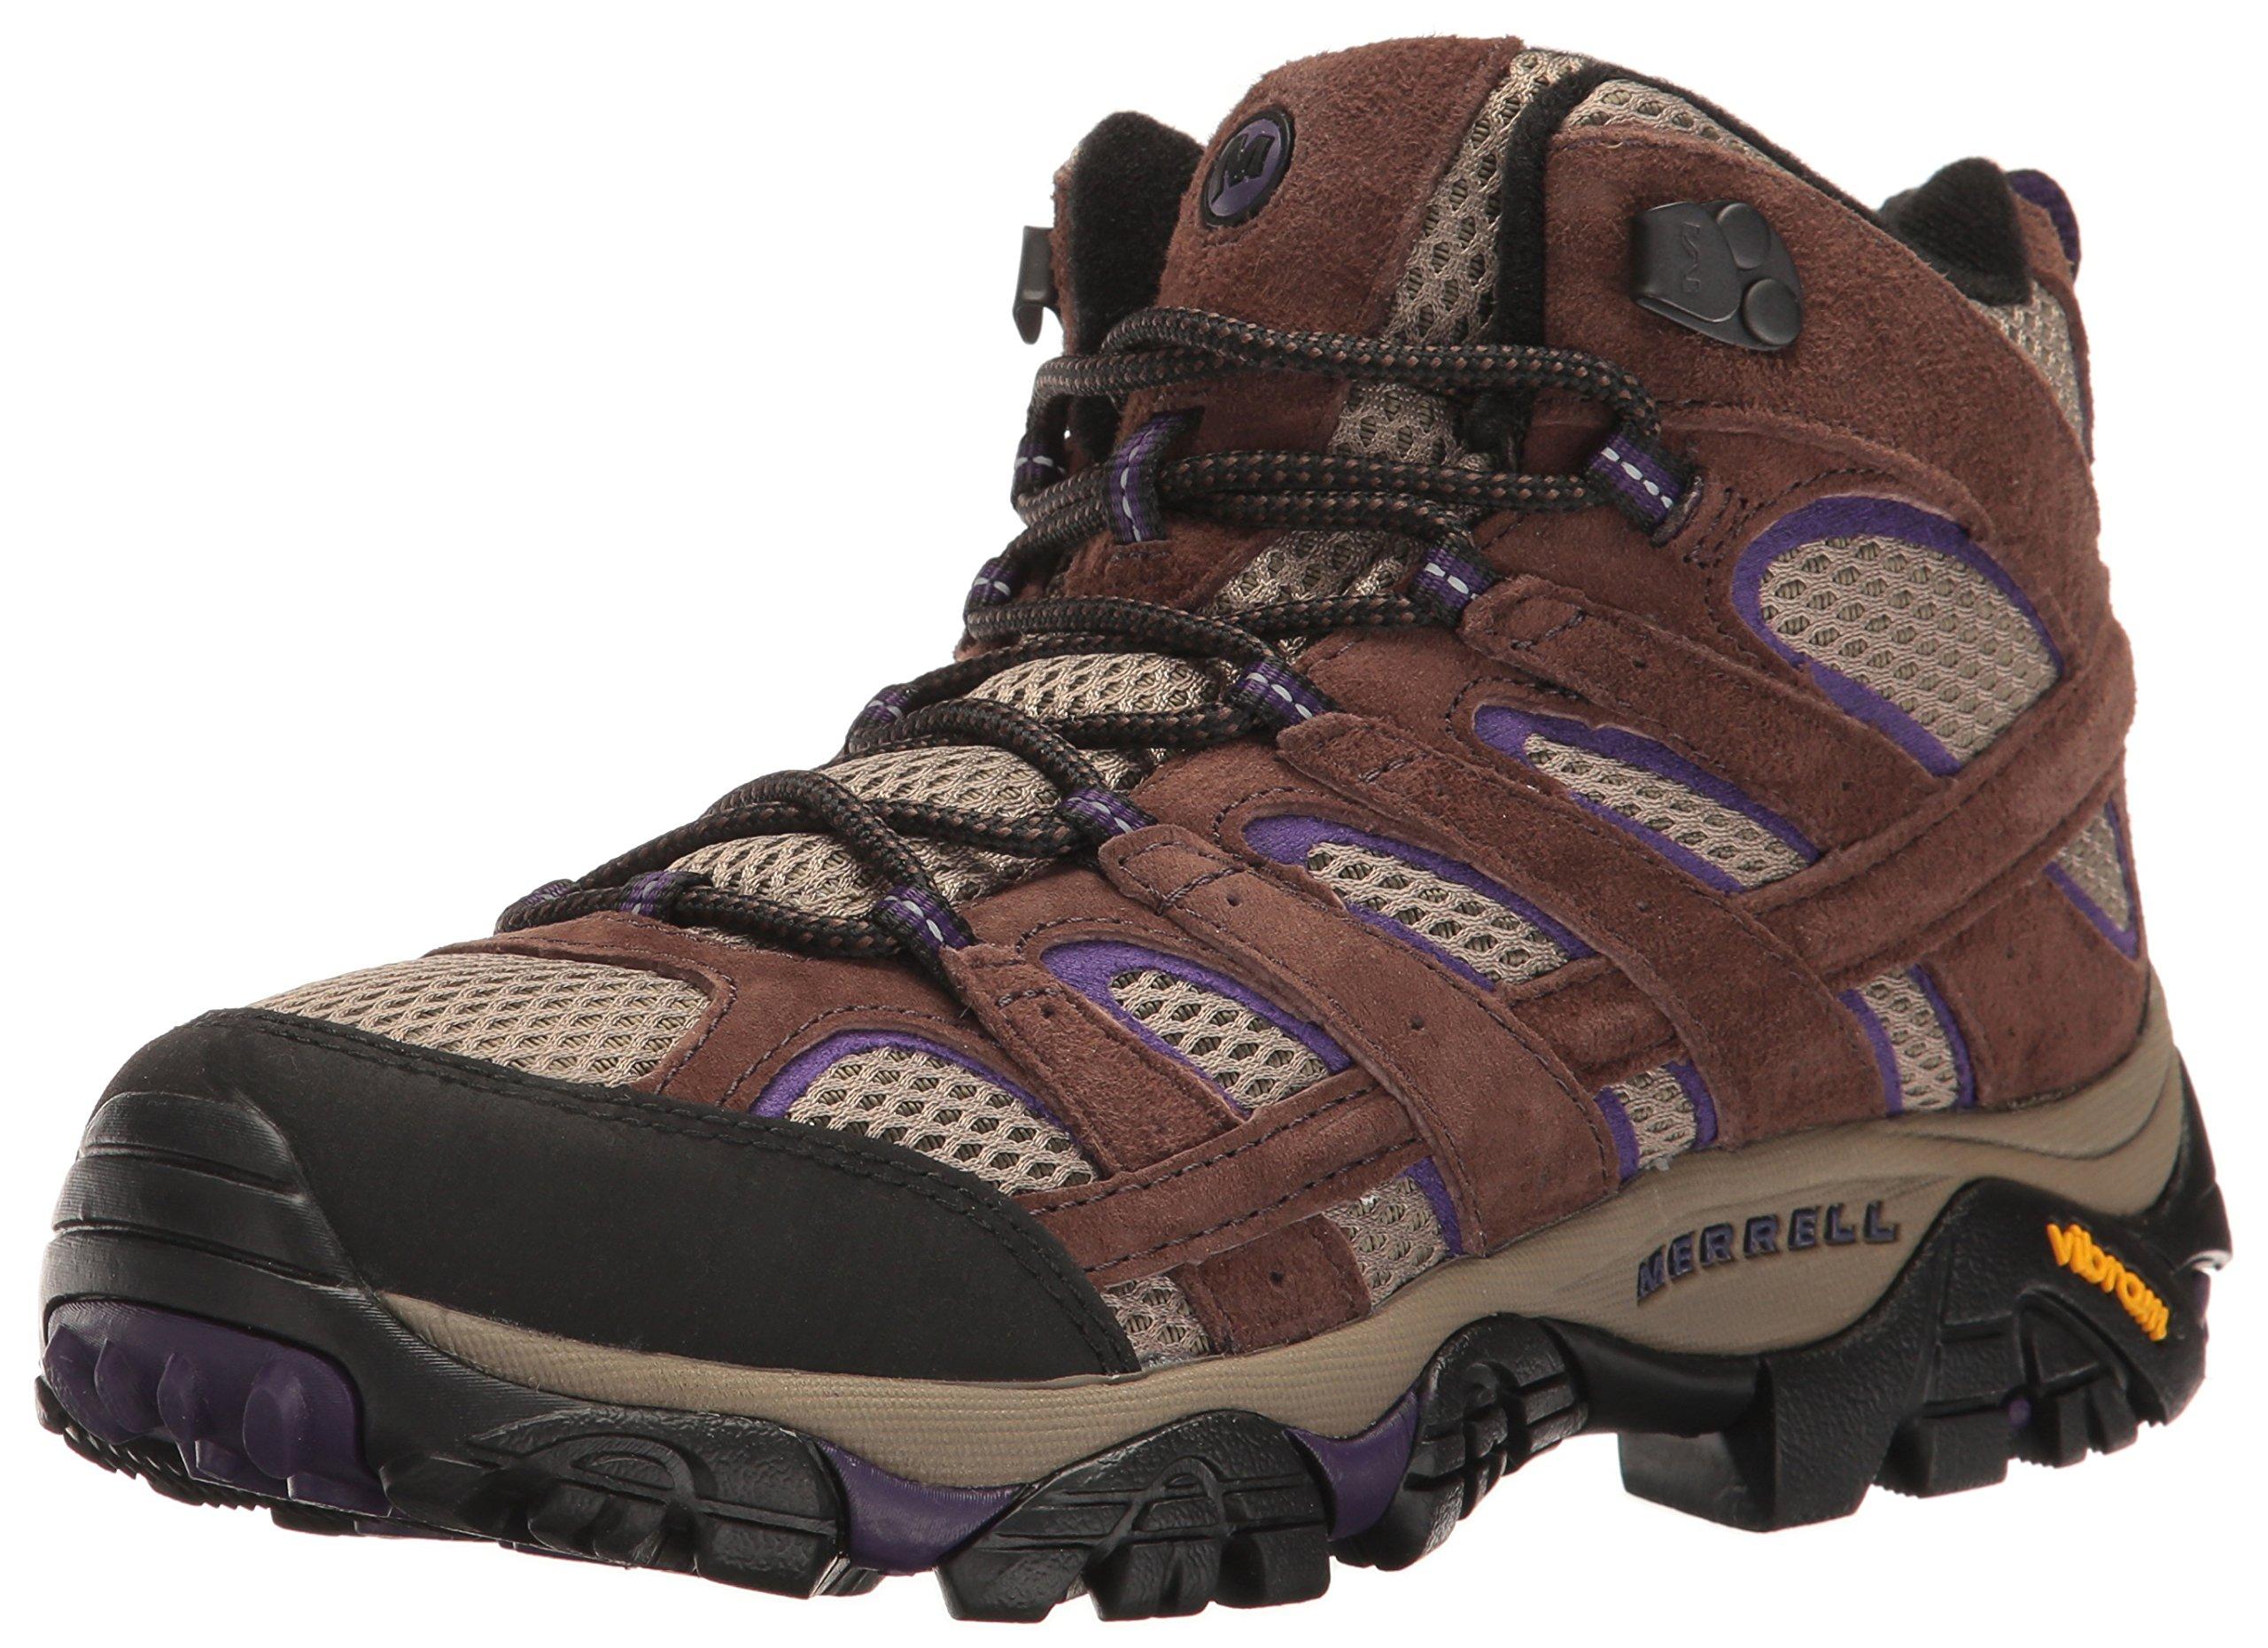 Merrell Women's Moab 2 Vent Mid, Bracken/Purple, 6.5 M by Merrell